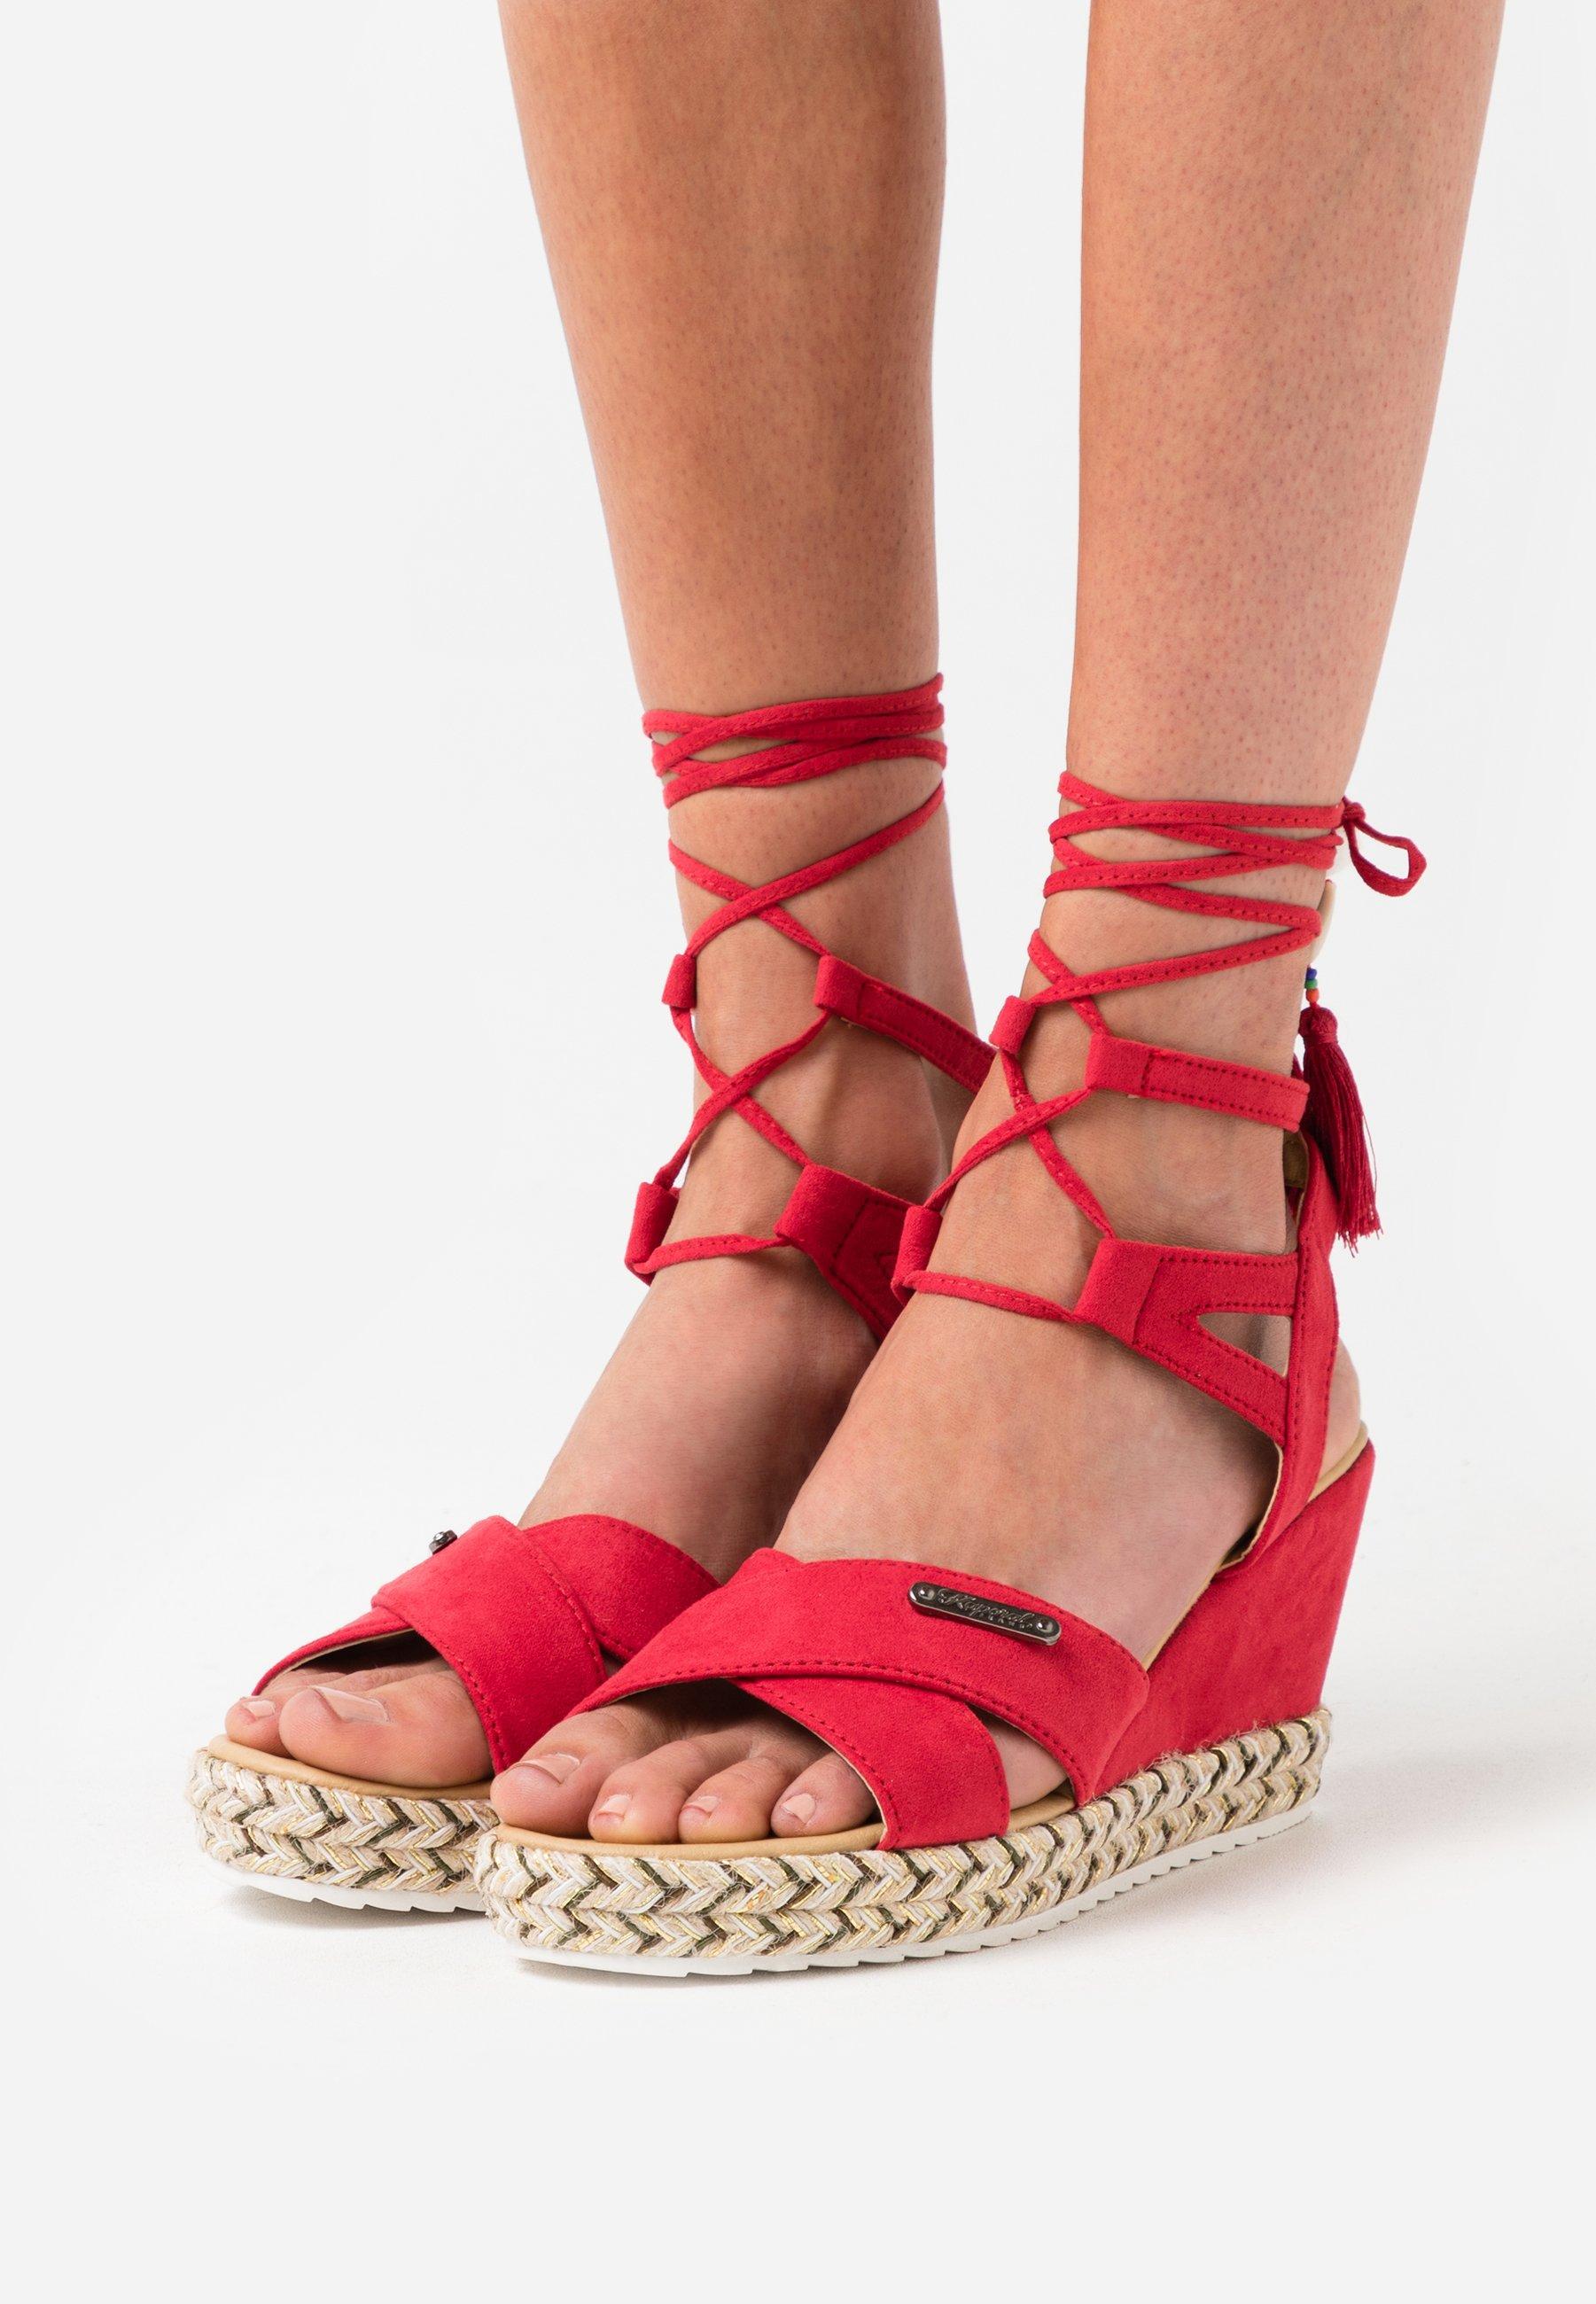 Kaporal TANAYA - Espadrilles - rouge - Sandales & Nu-pieds femme Classique